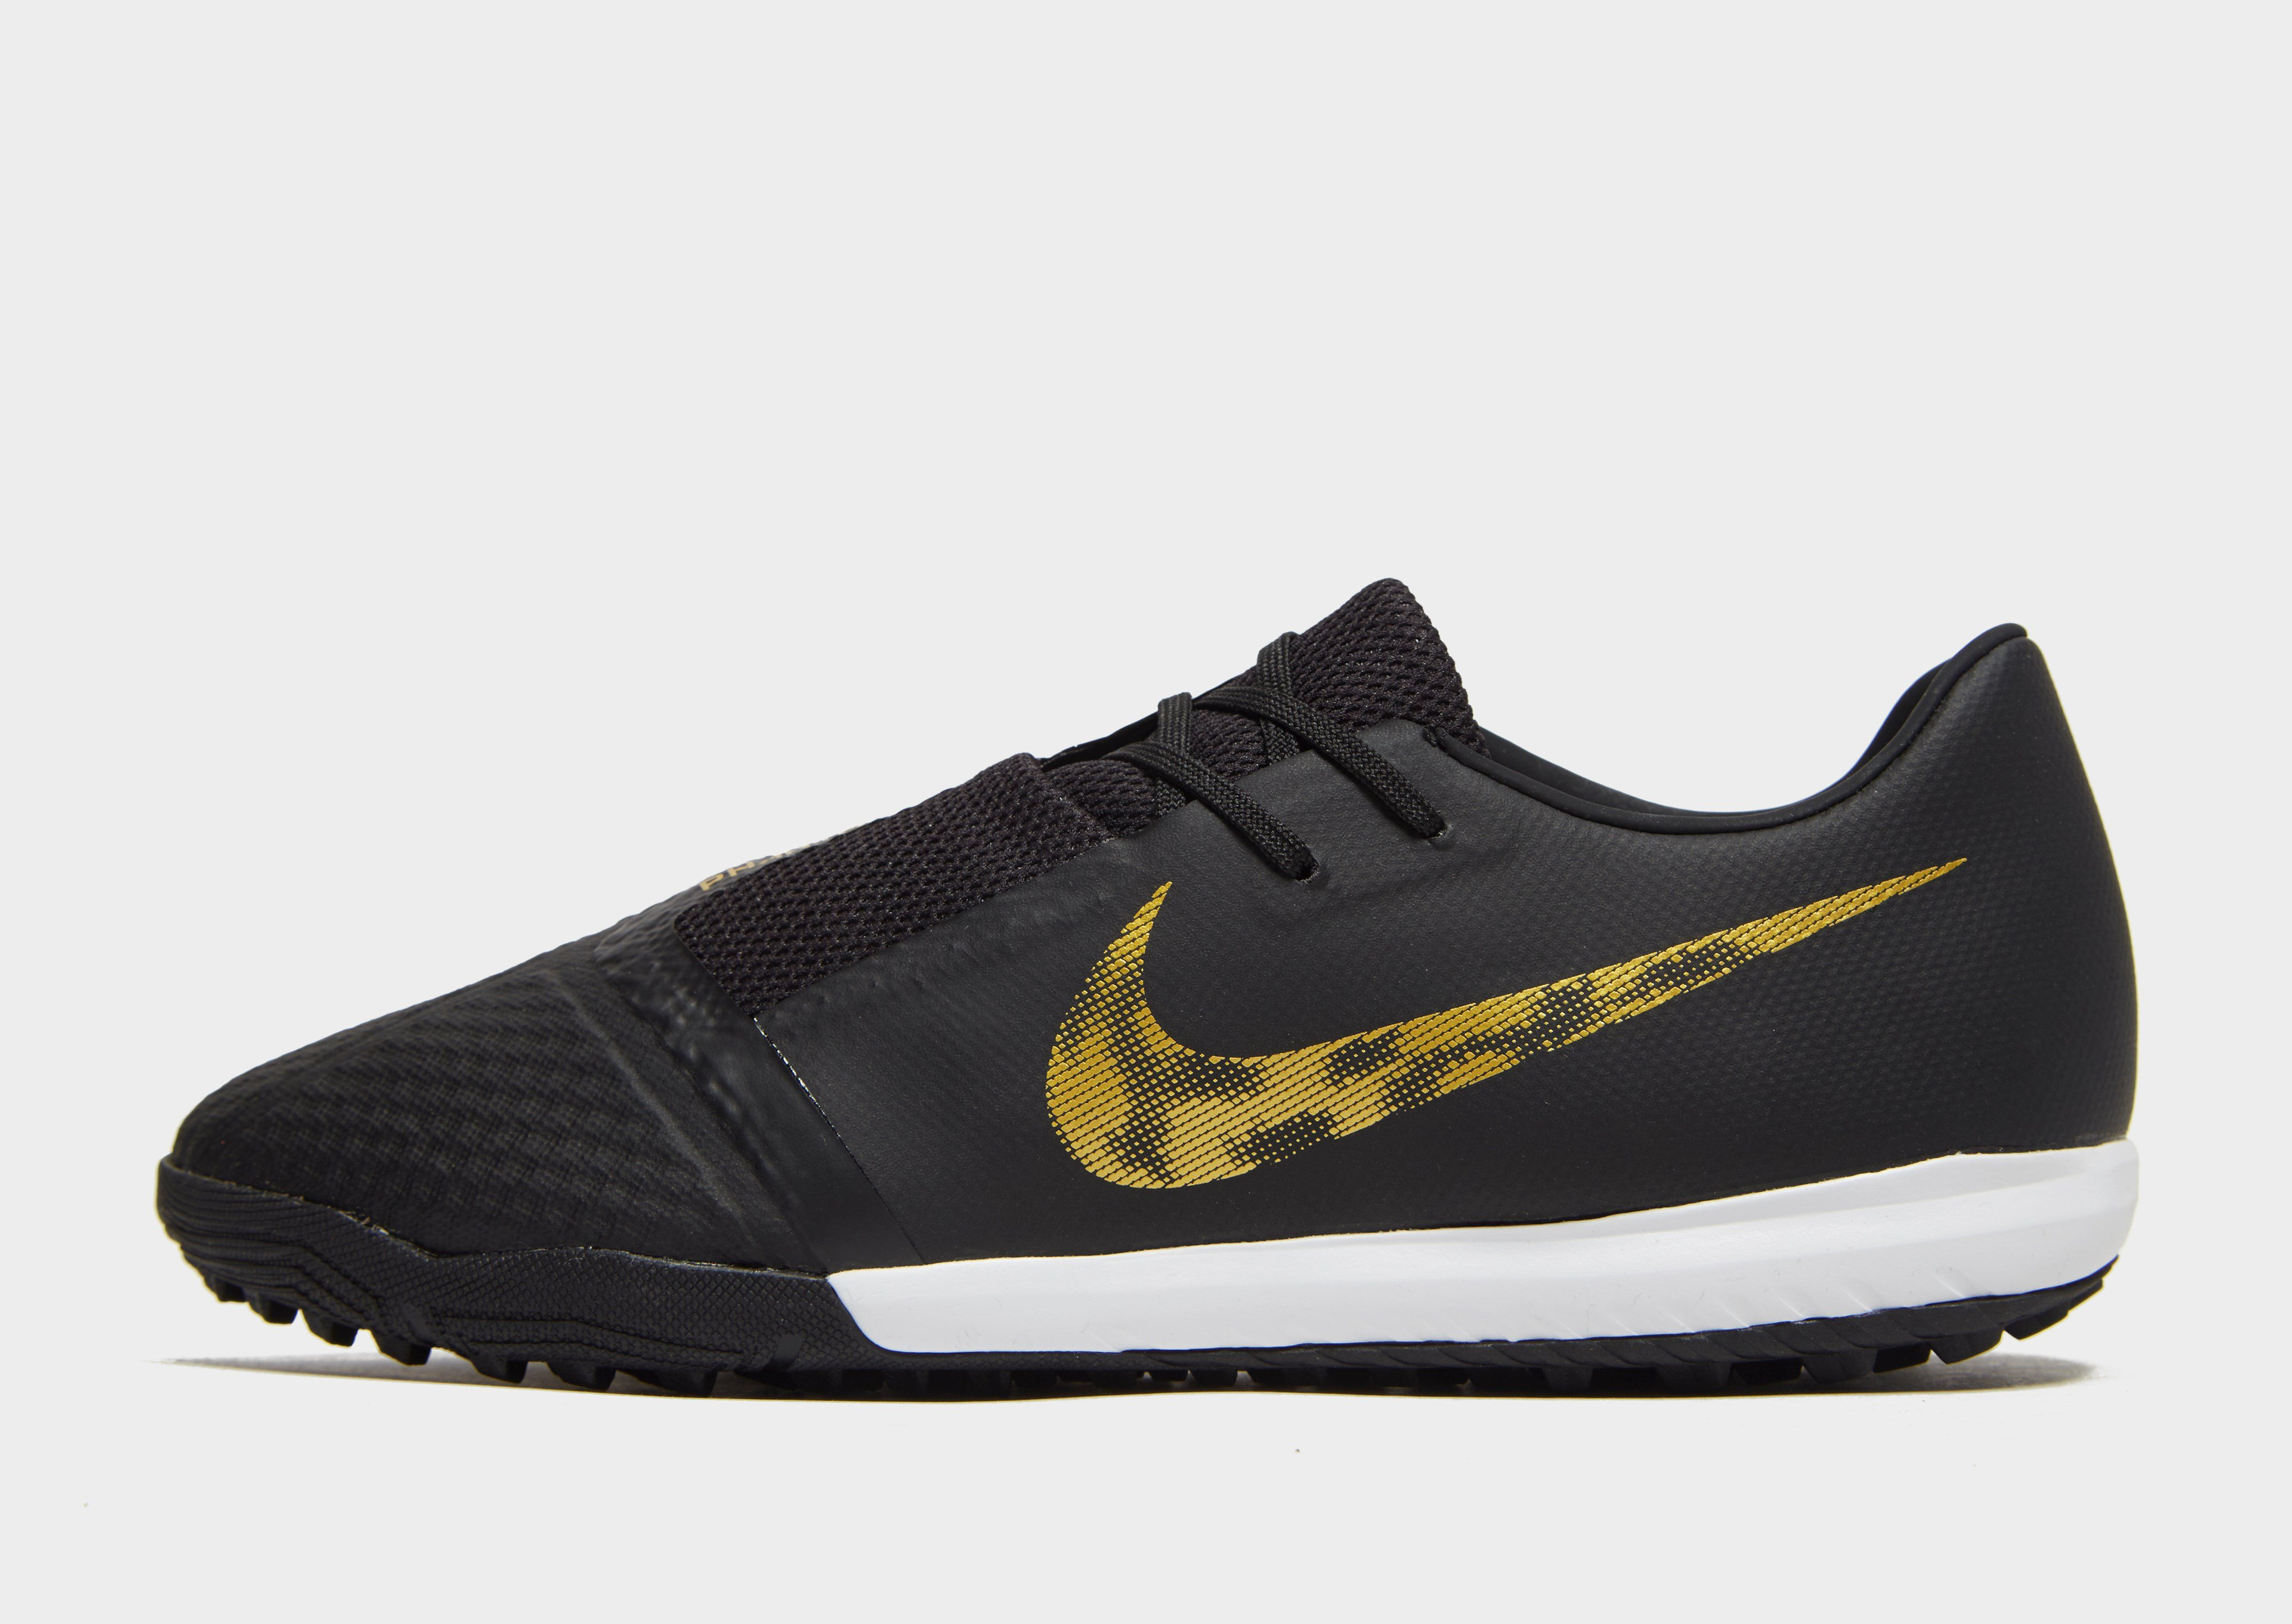 73927c7982b Nike Black Lux Phantom Venom Academy TF